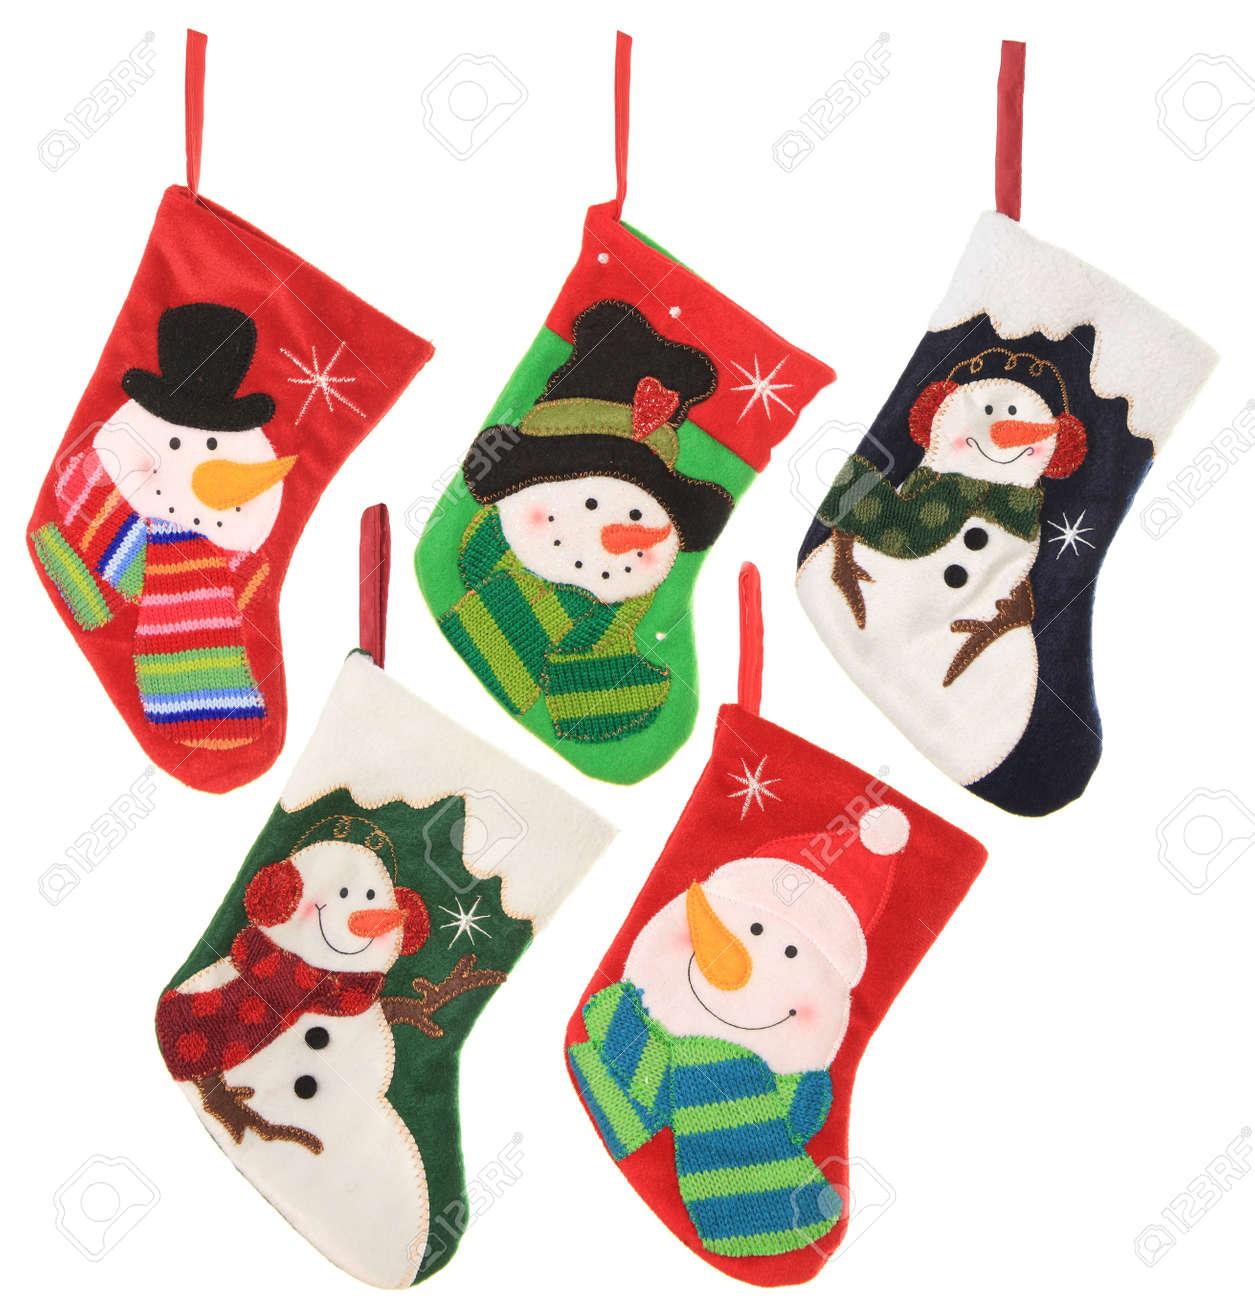 Five friendly snowman Christmas stockings, studio isolated on white Stock Photo - 16482385